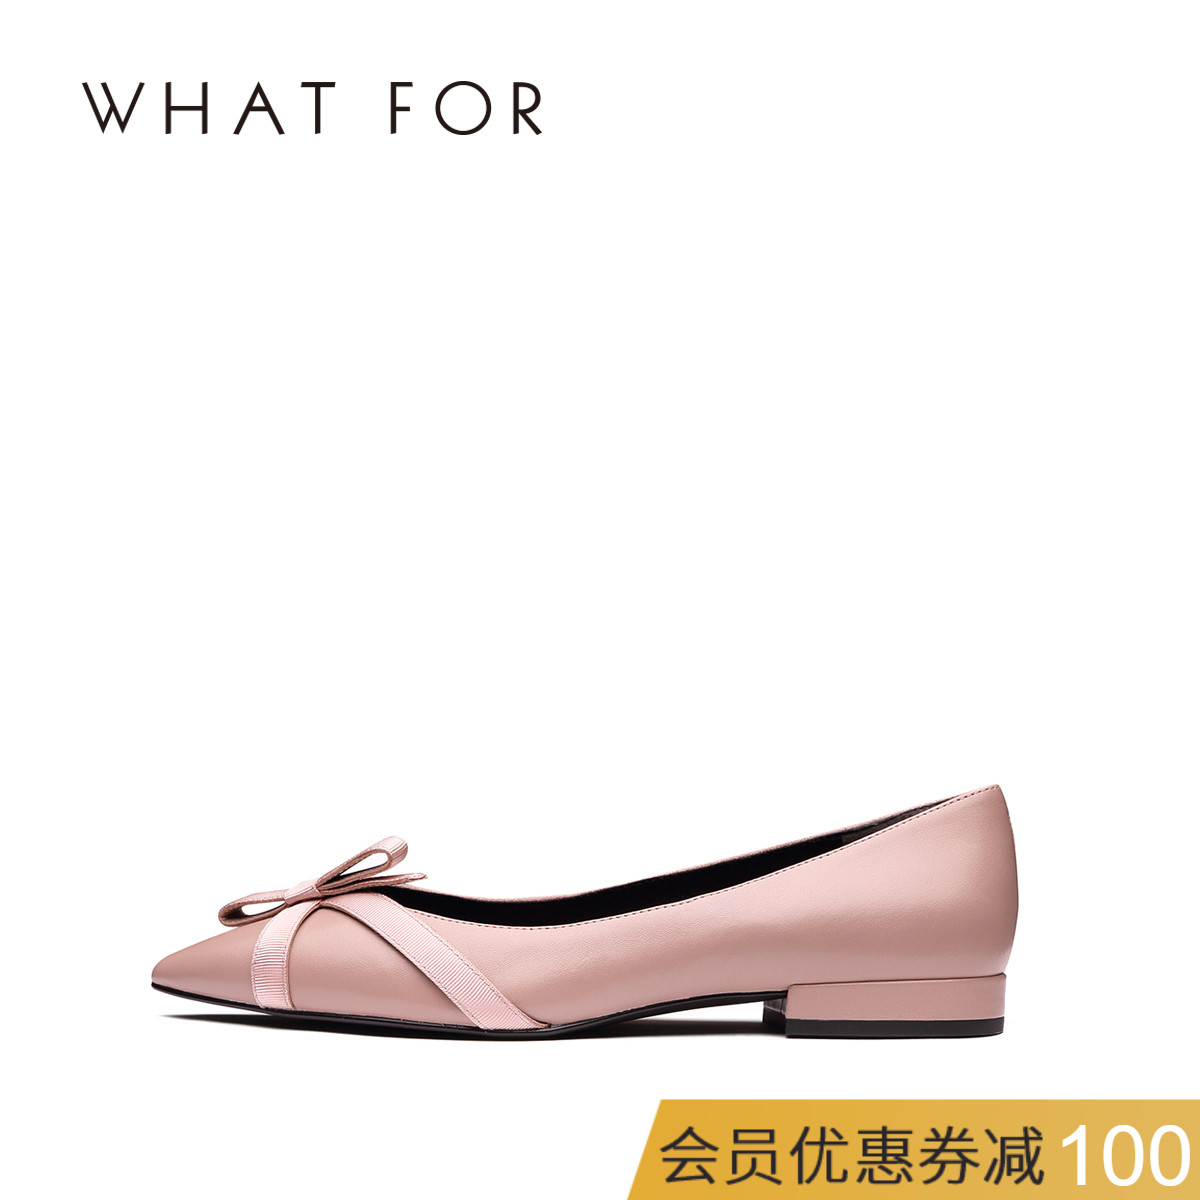 WHAT FOR2018秋季新款羊皮蝴蝶結簡約淺口尖頭低跟平底鞋女單鞋